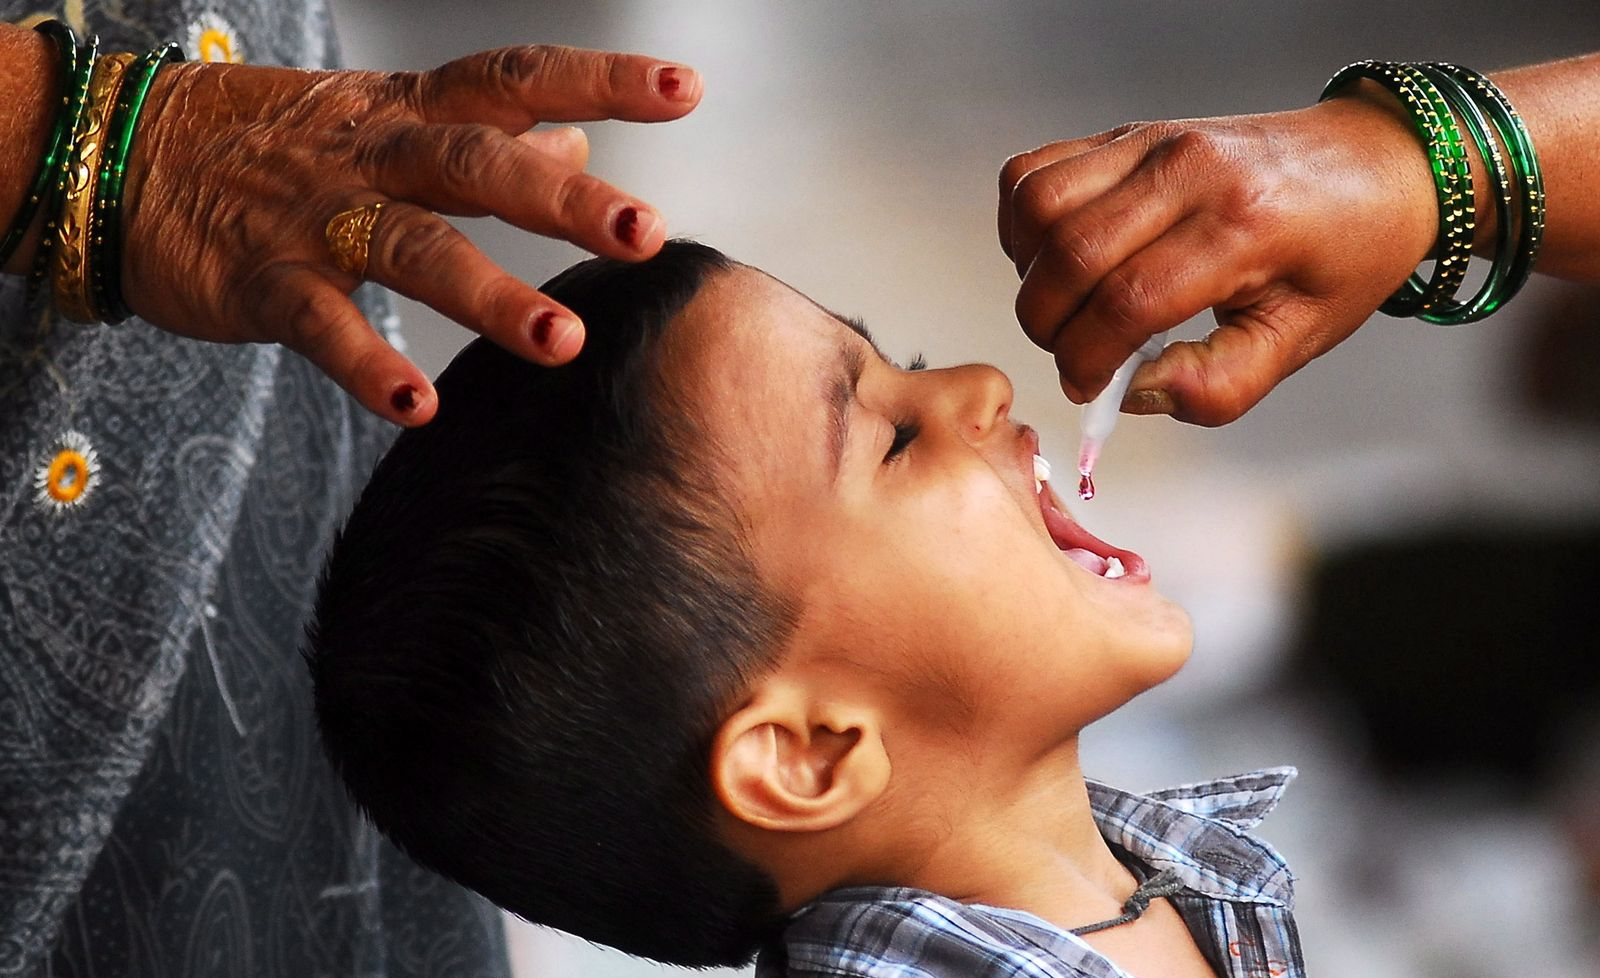 Indien / Polio-Impfung